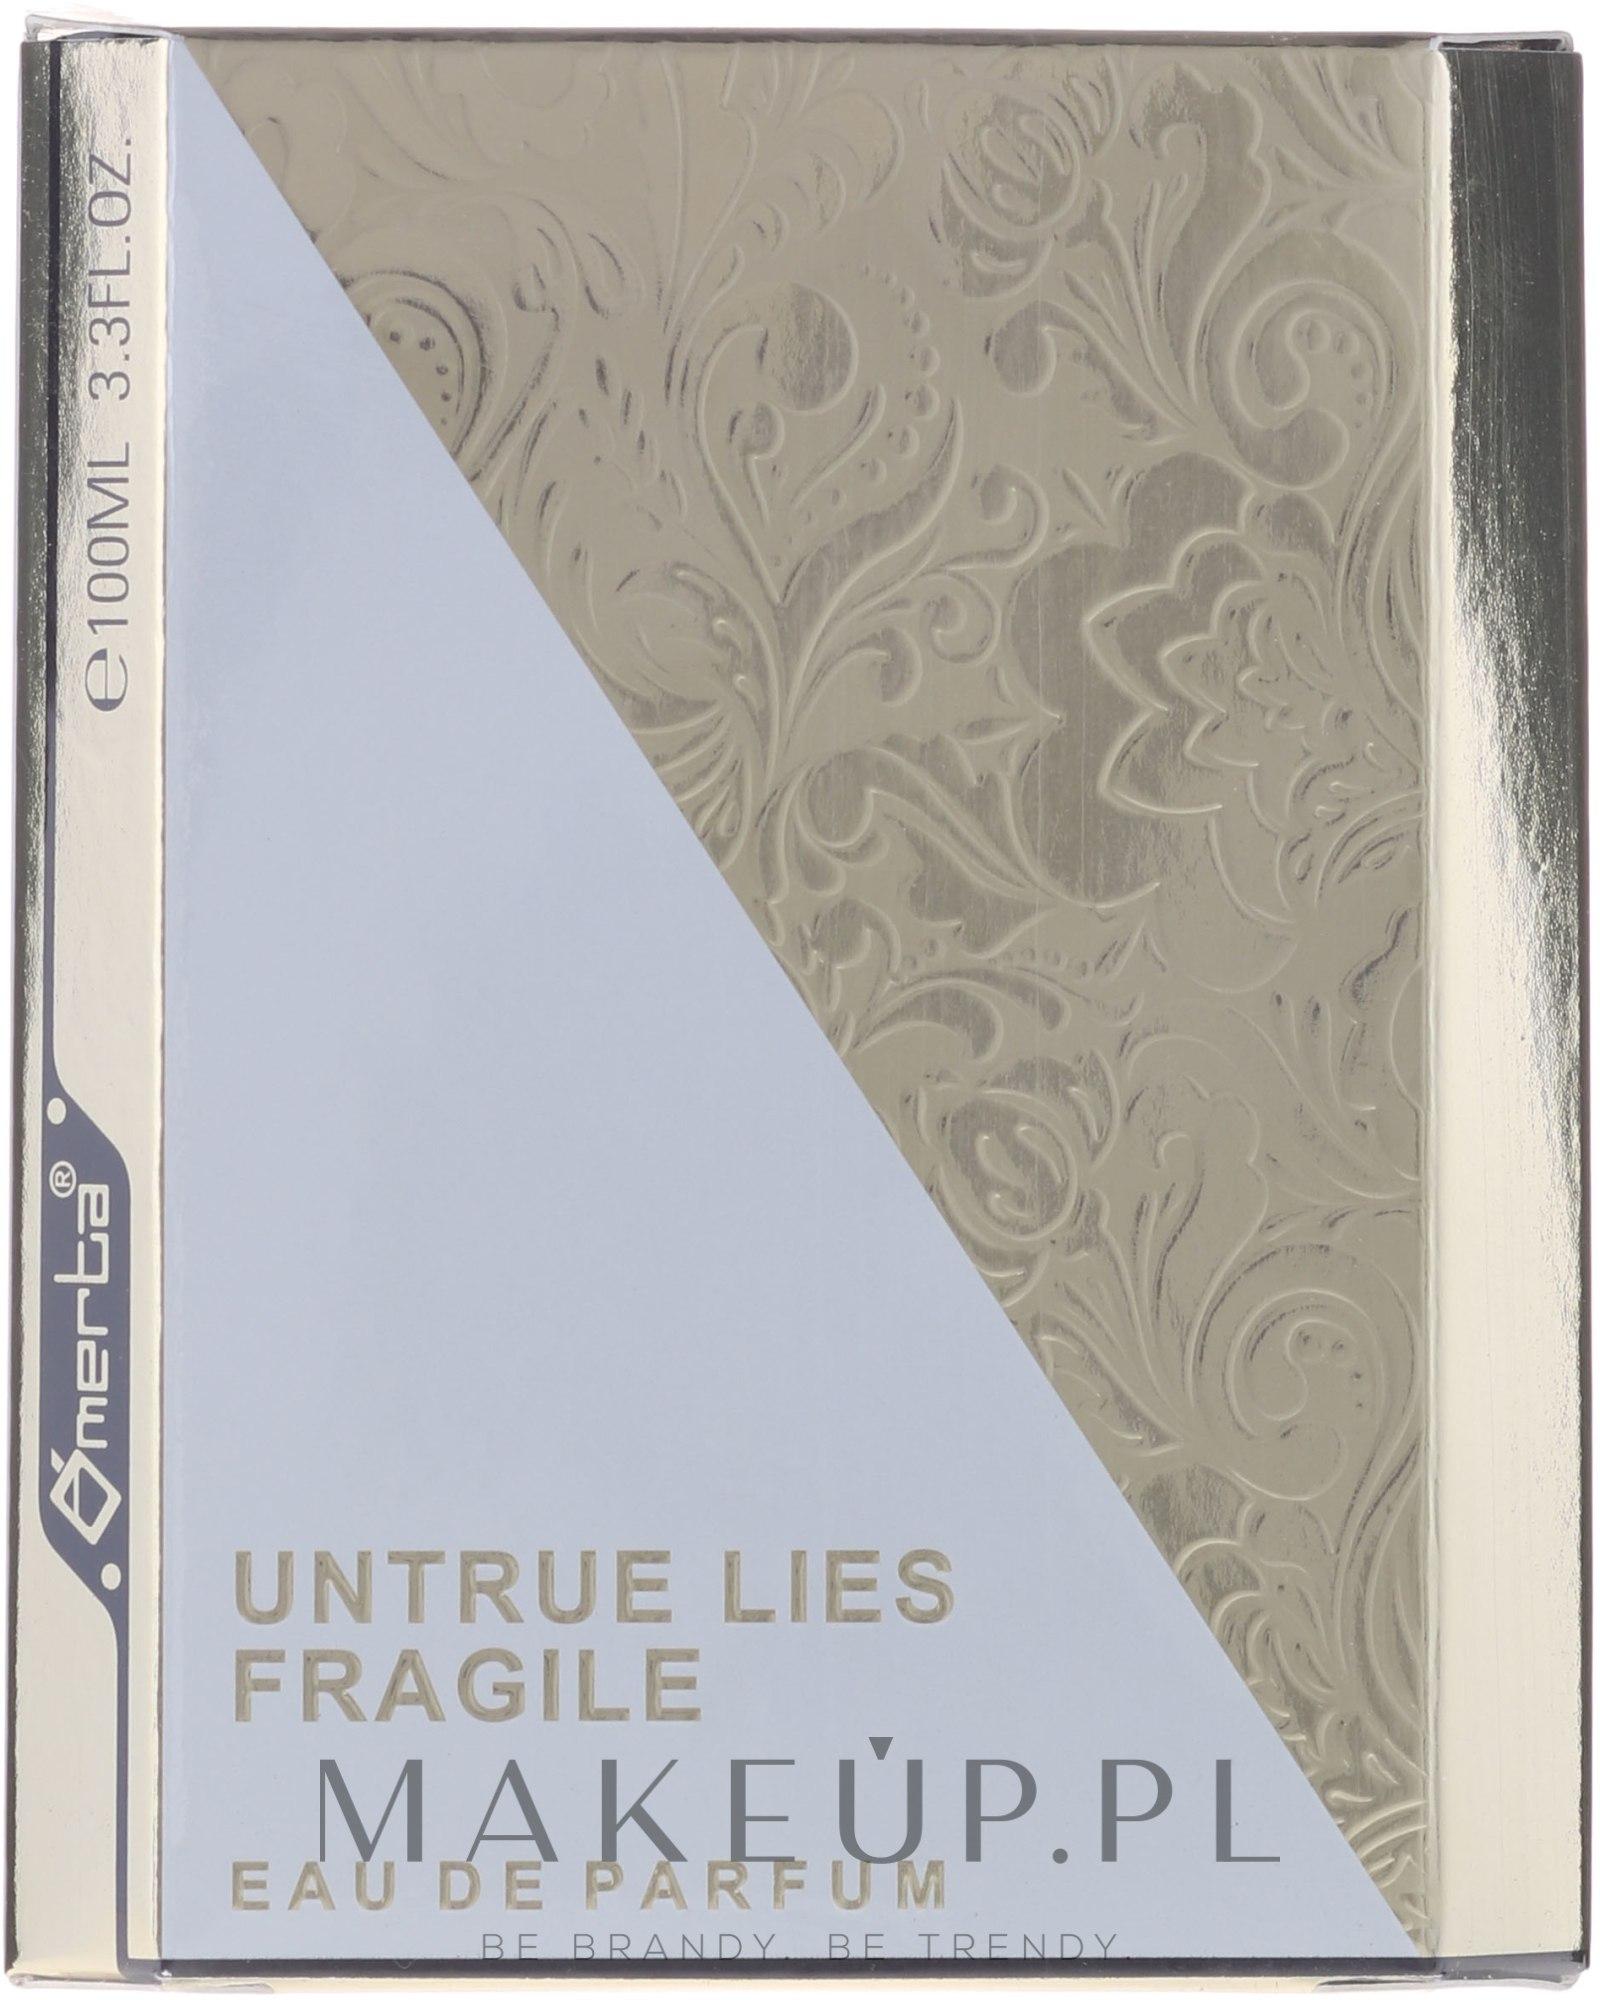 omerta untrue lies fragile